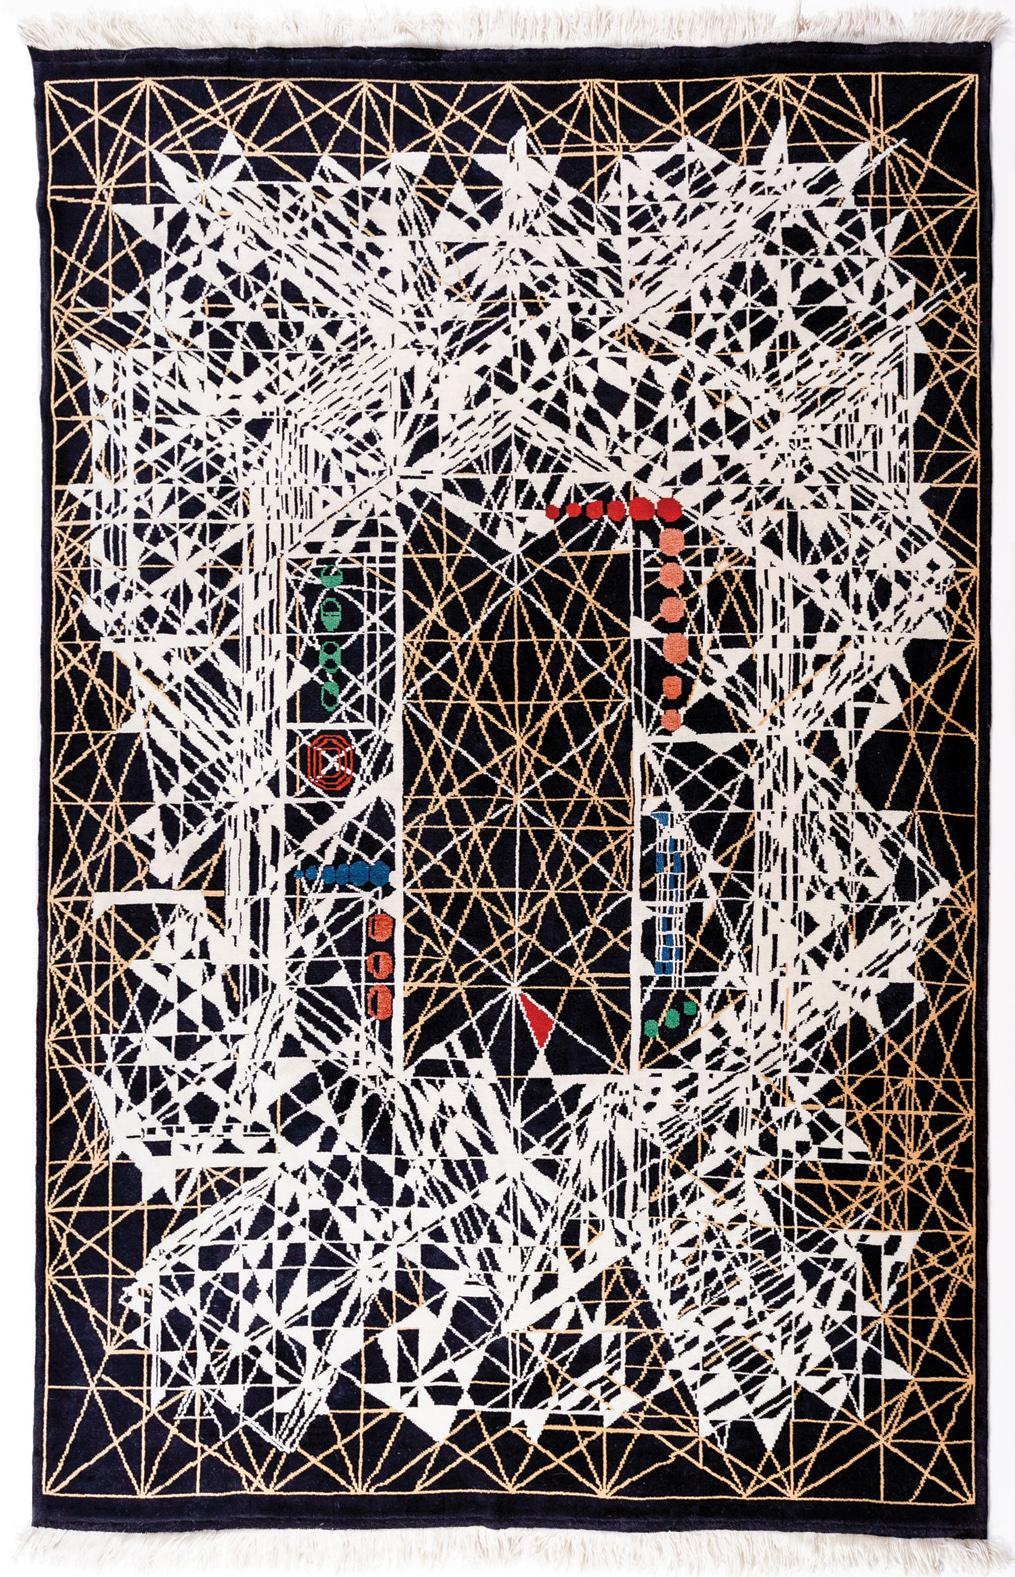 "'Venus' carpet by Viron Erol Vert sized 2.00m x 3.00m (6'7"" x 9'10""), circa 2012. | Image courtesy of Viron Erol Vert."